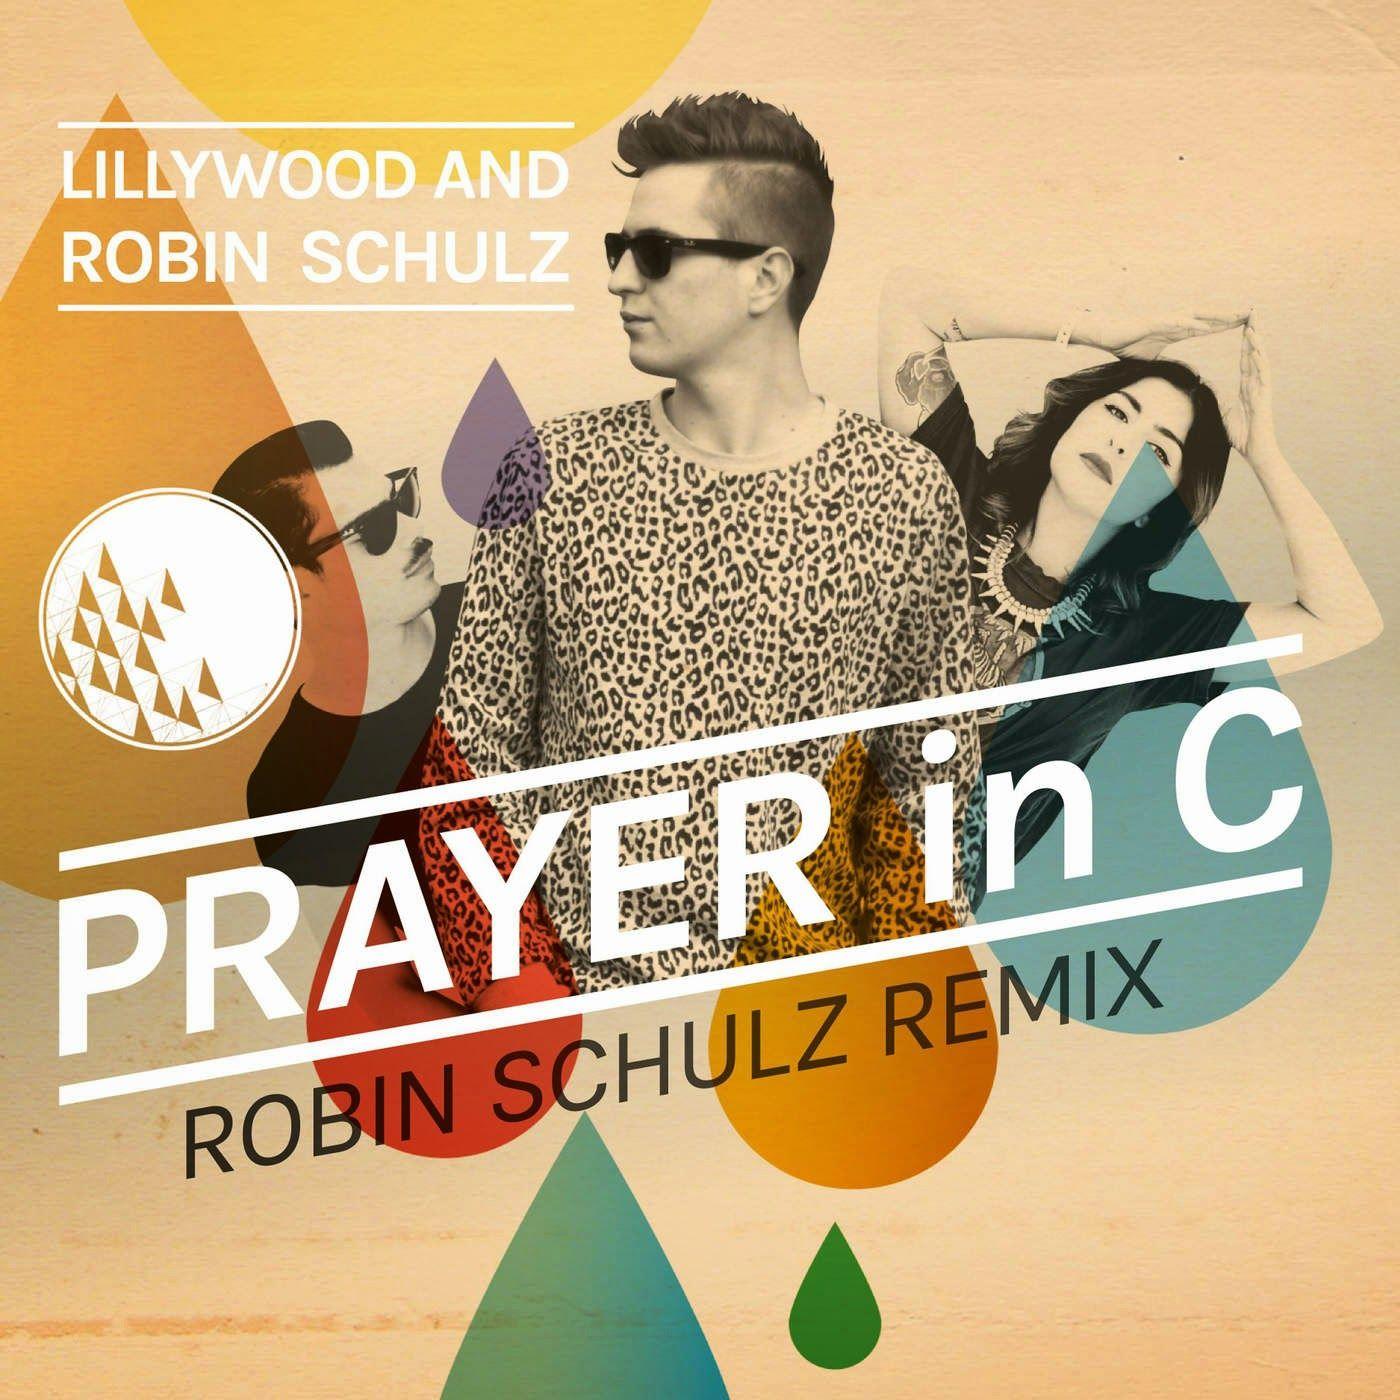 Tony's Dance Radio Edits Part III: Robin Schulz & Lillywood Feat. The Prick Prayer In...